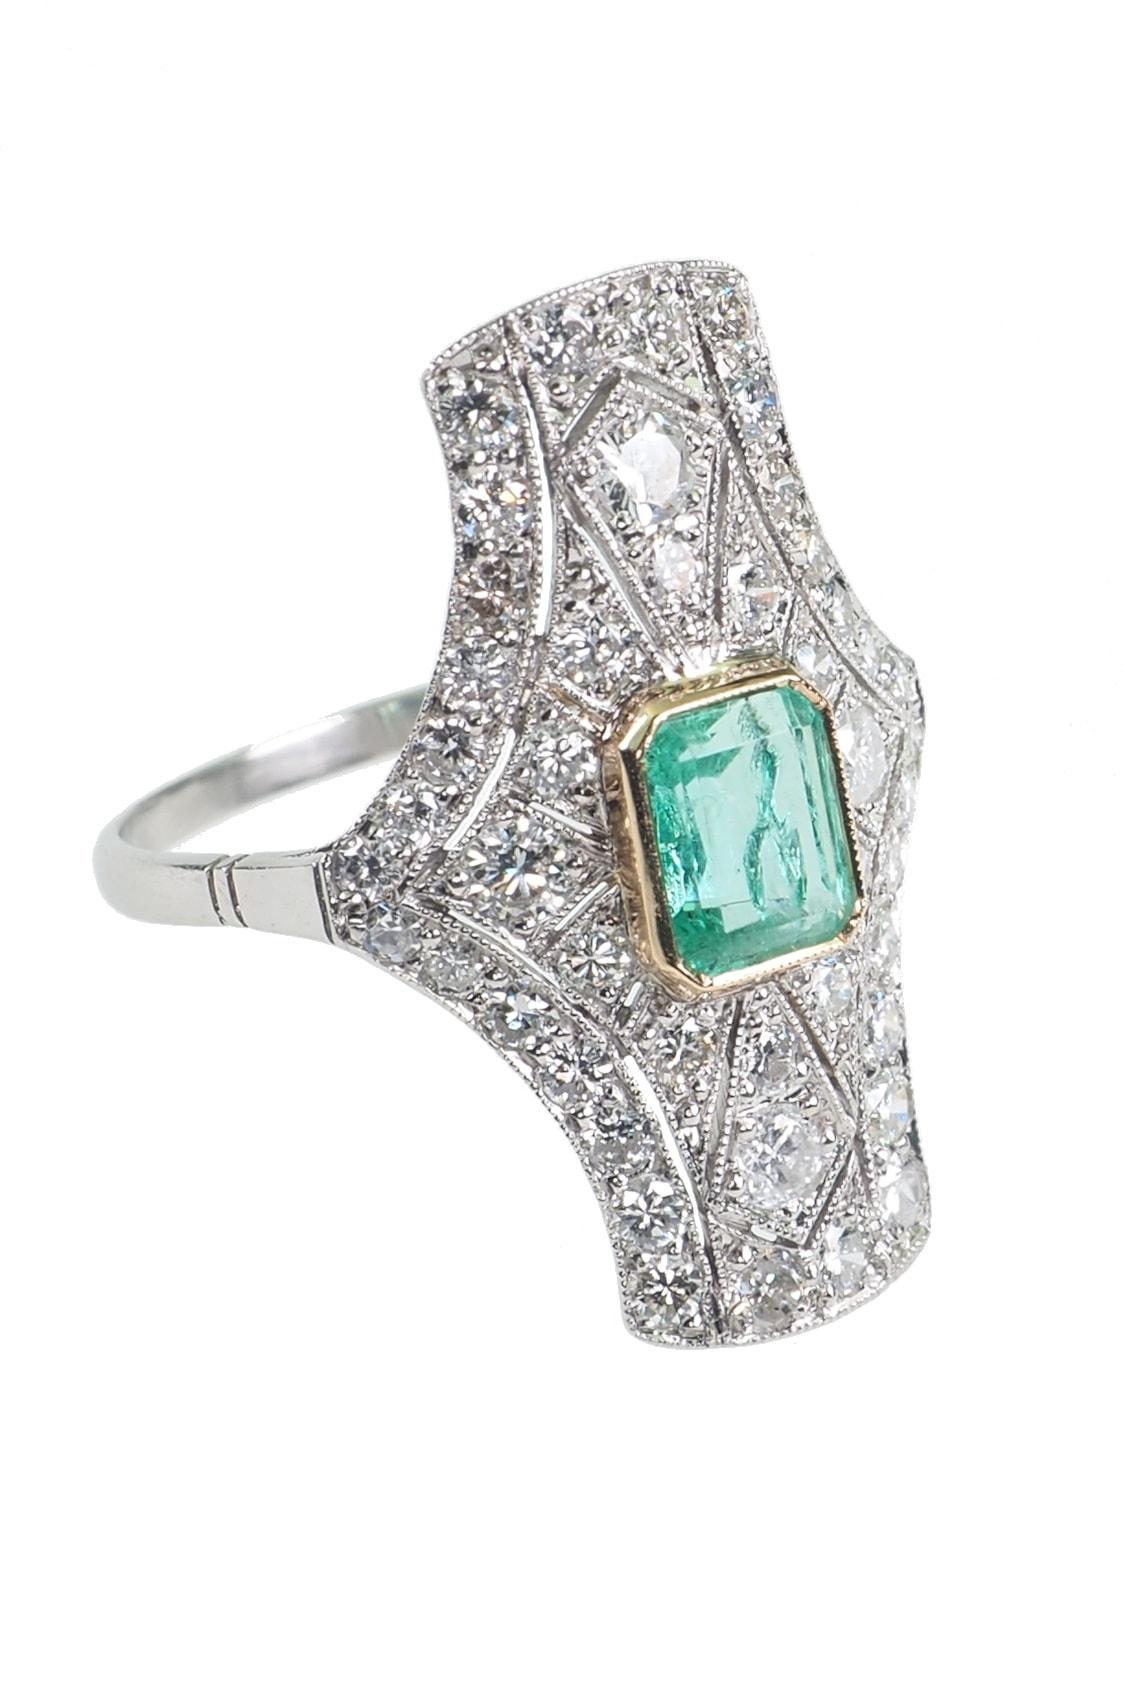 Smaragdring-online-kaufen-0194